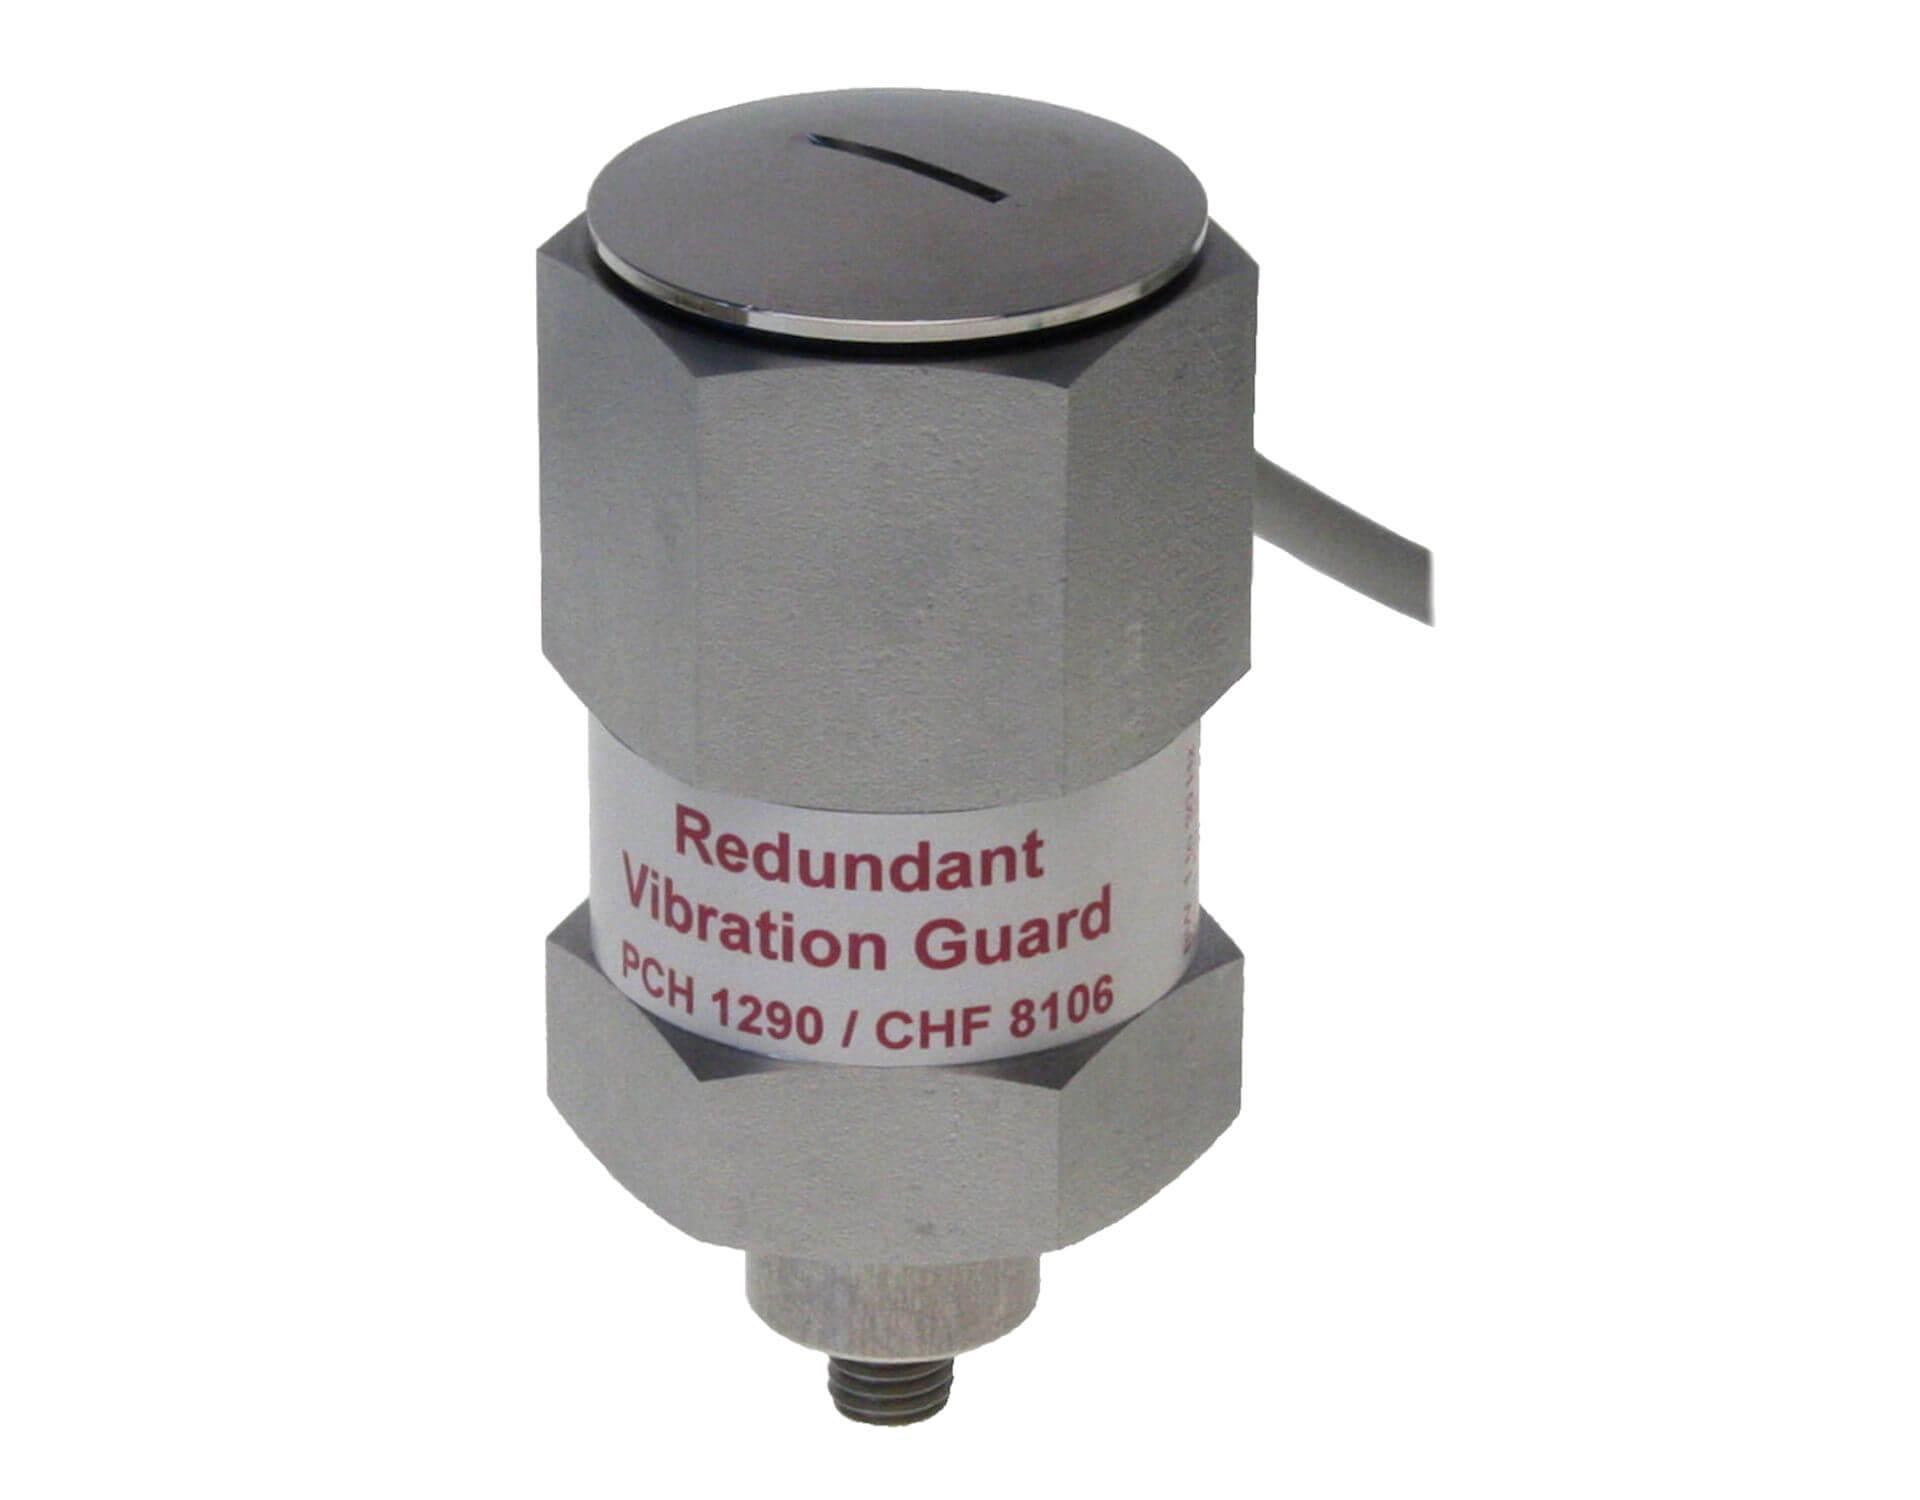 Redundant Vibration Monitors